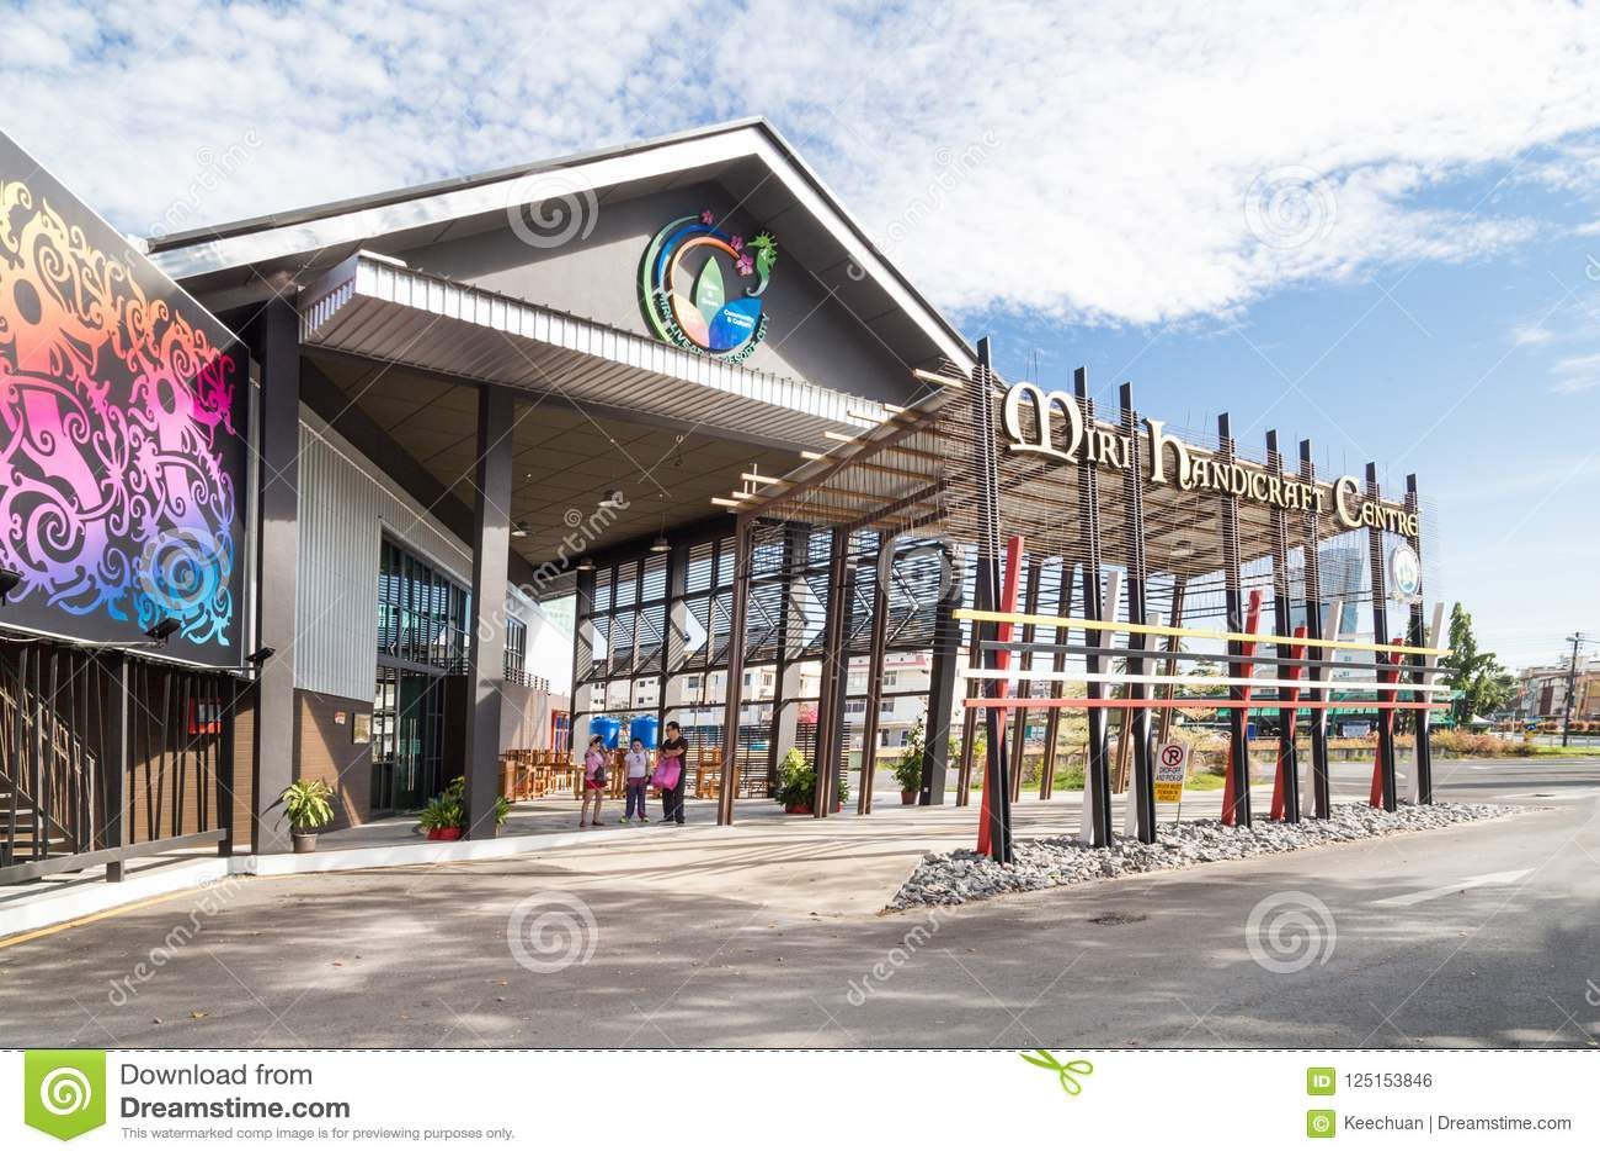 Miri Sarawak September 1st 2018 Miri Handicraft Center Promo